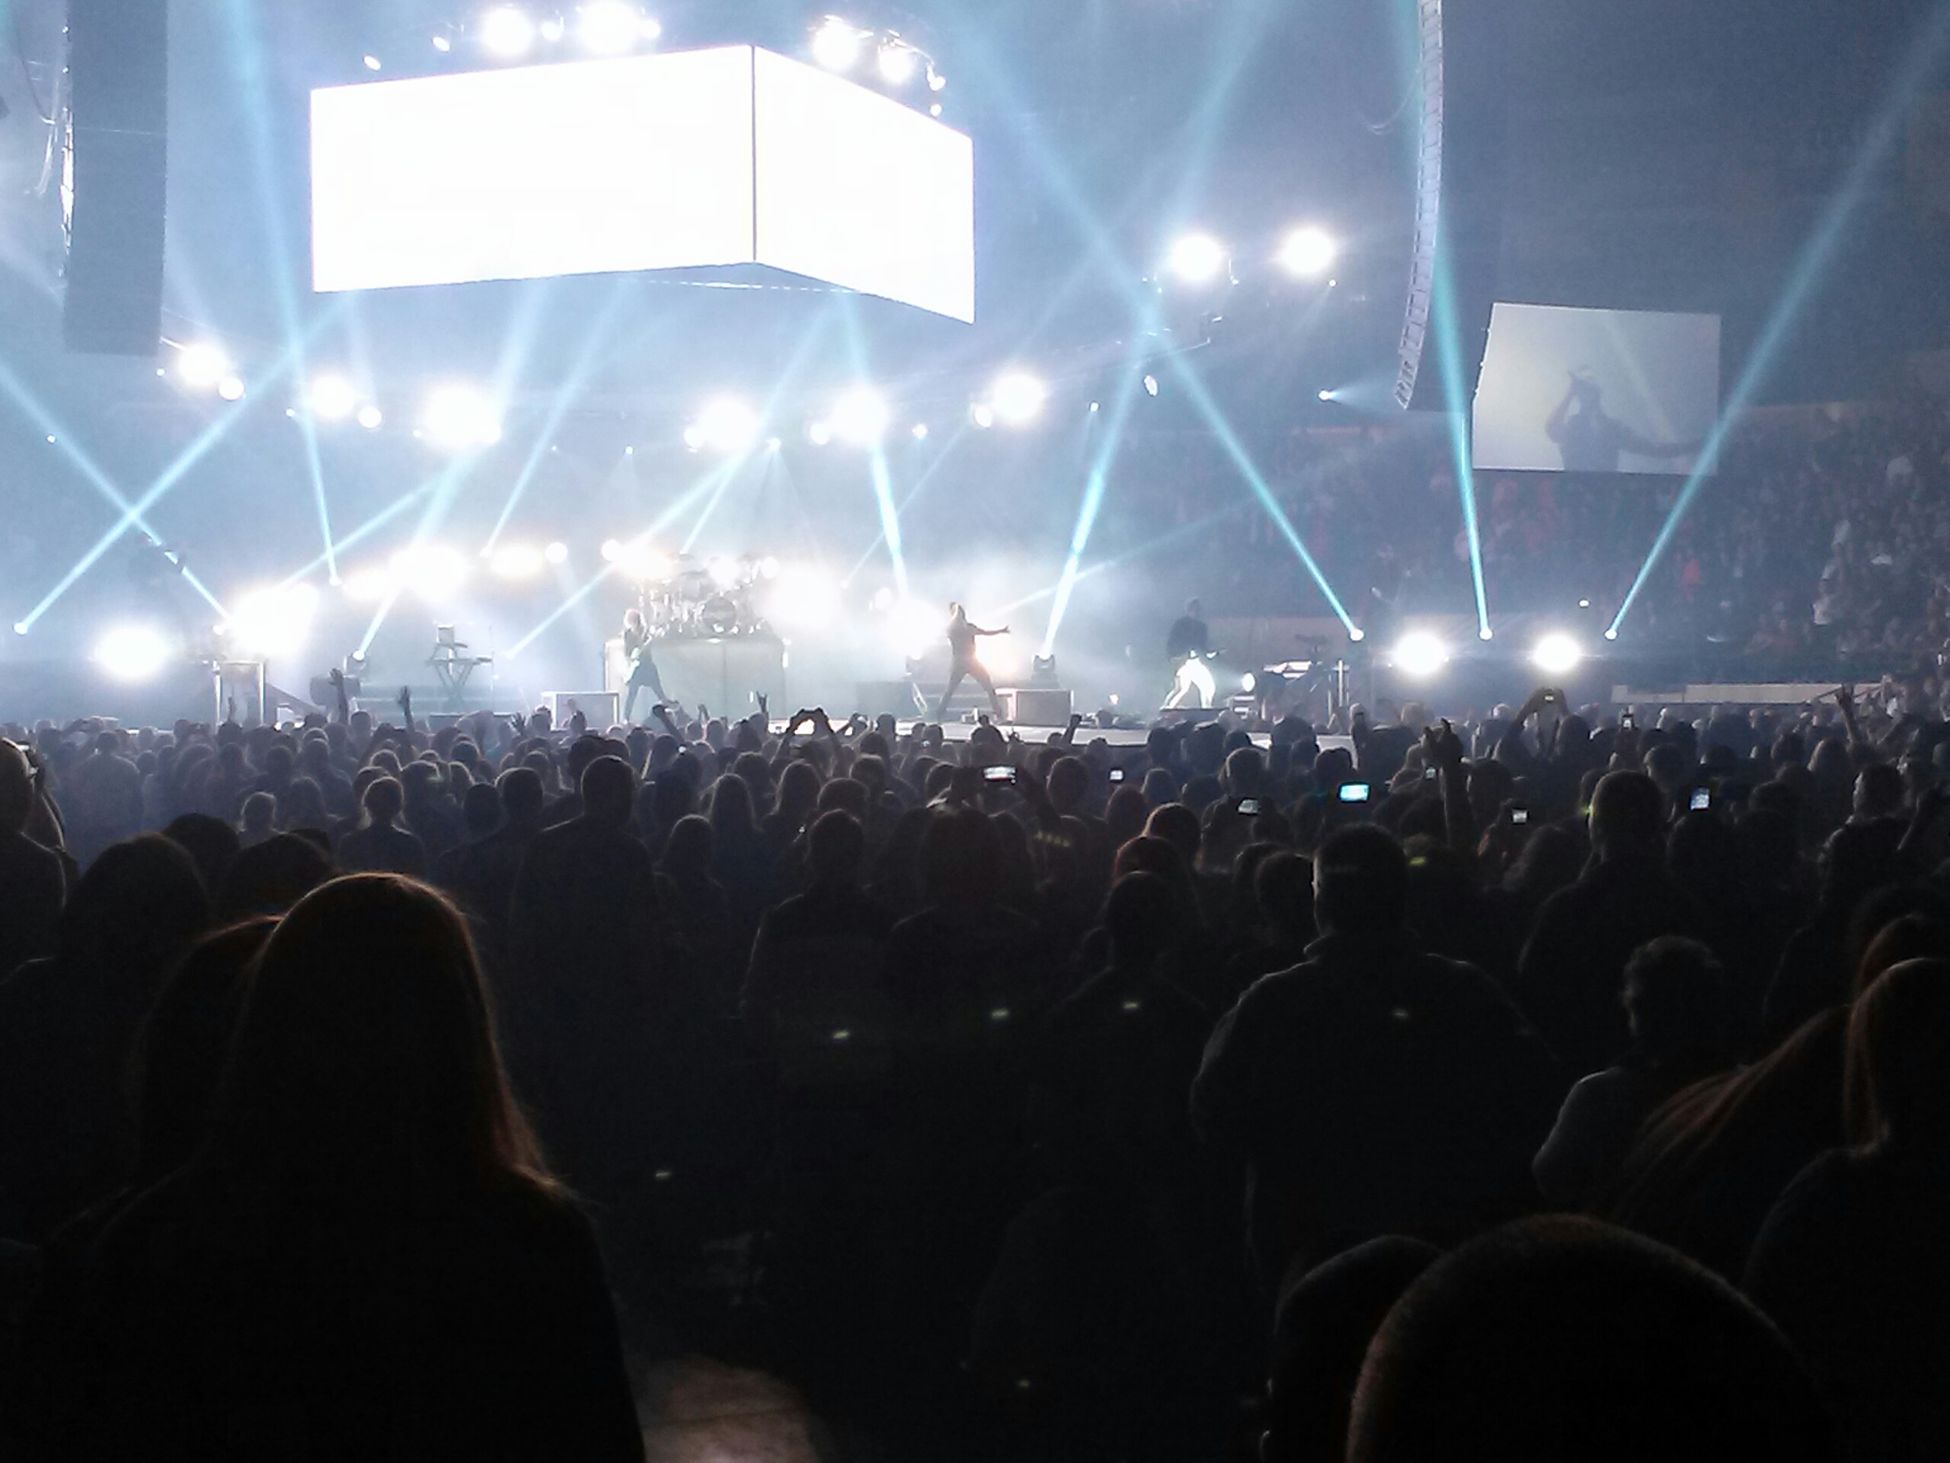 Killer Skillet performance at winterjam last night Skillet Winterjam Rock Stars Concert Awesome